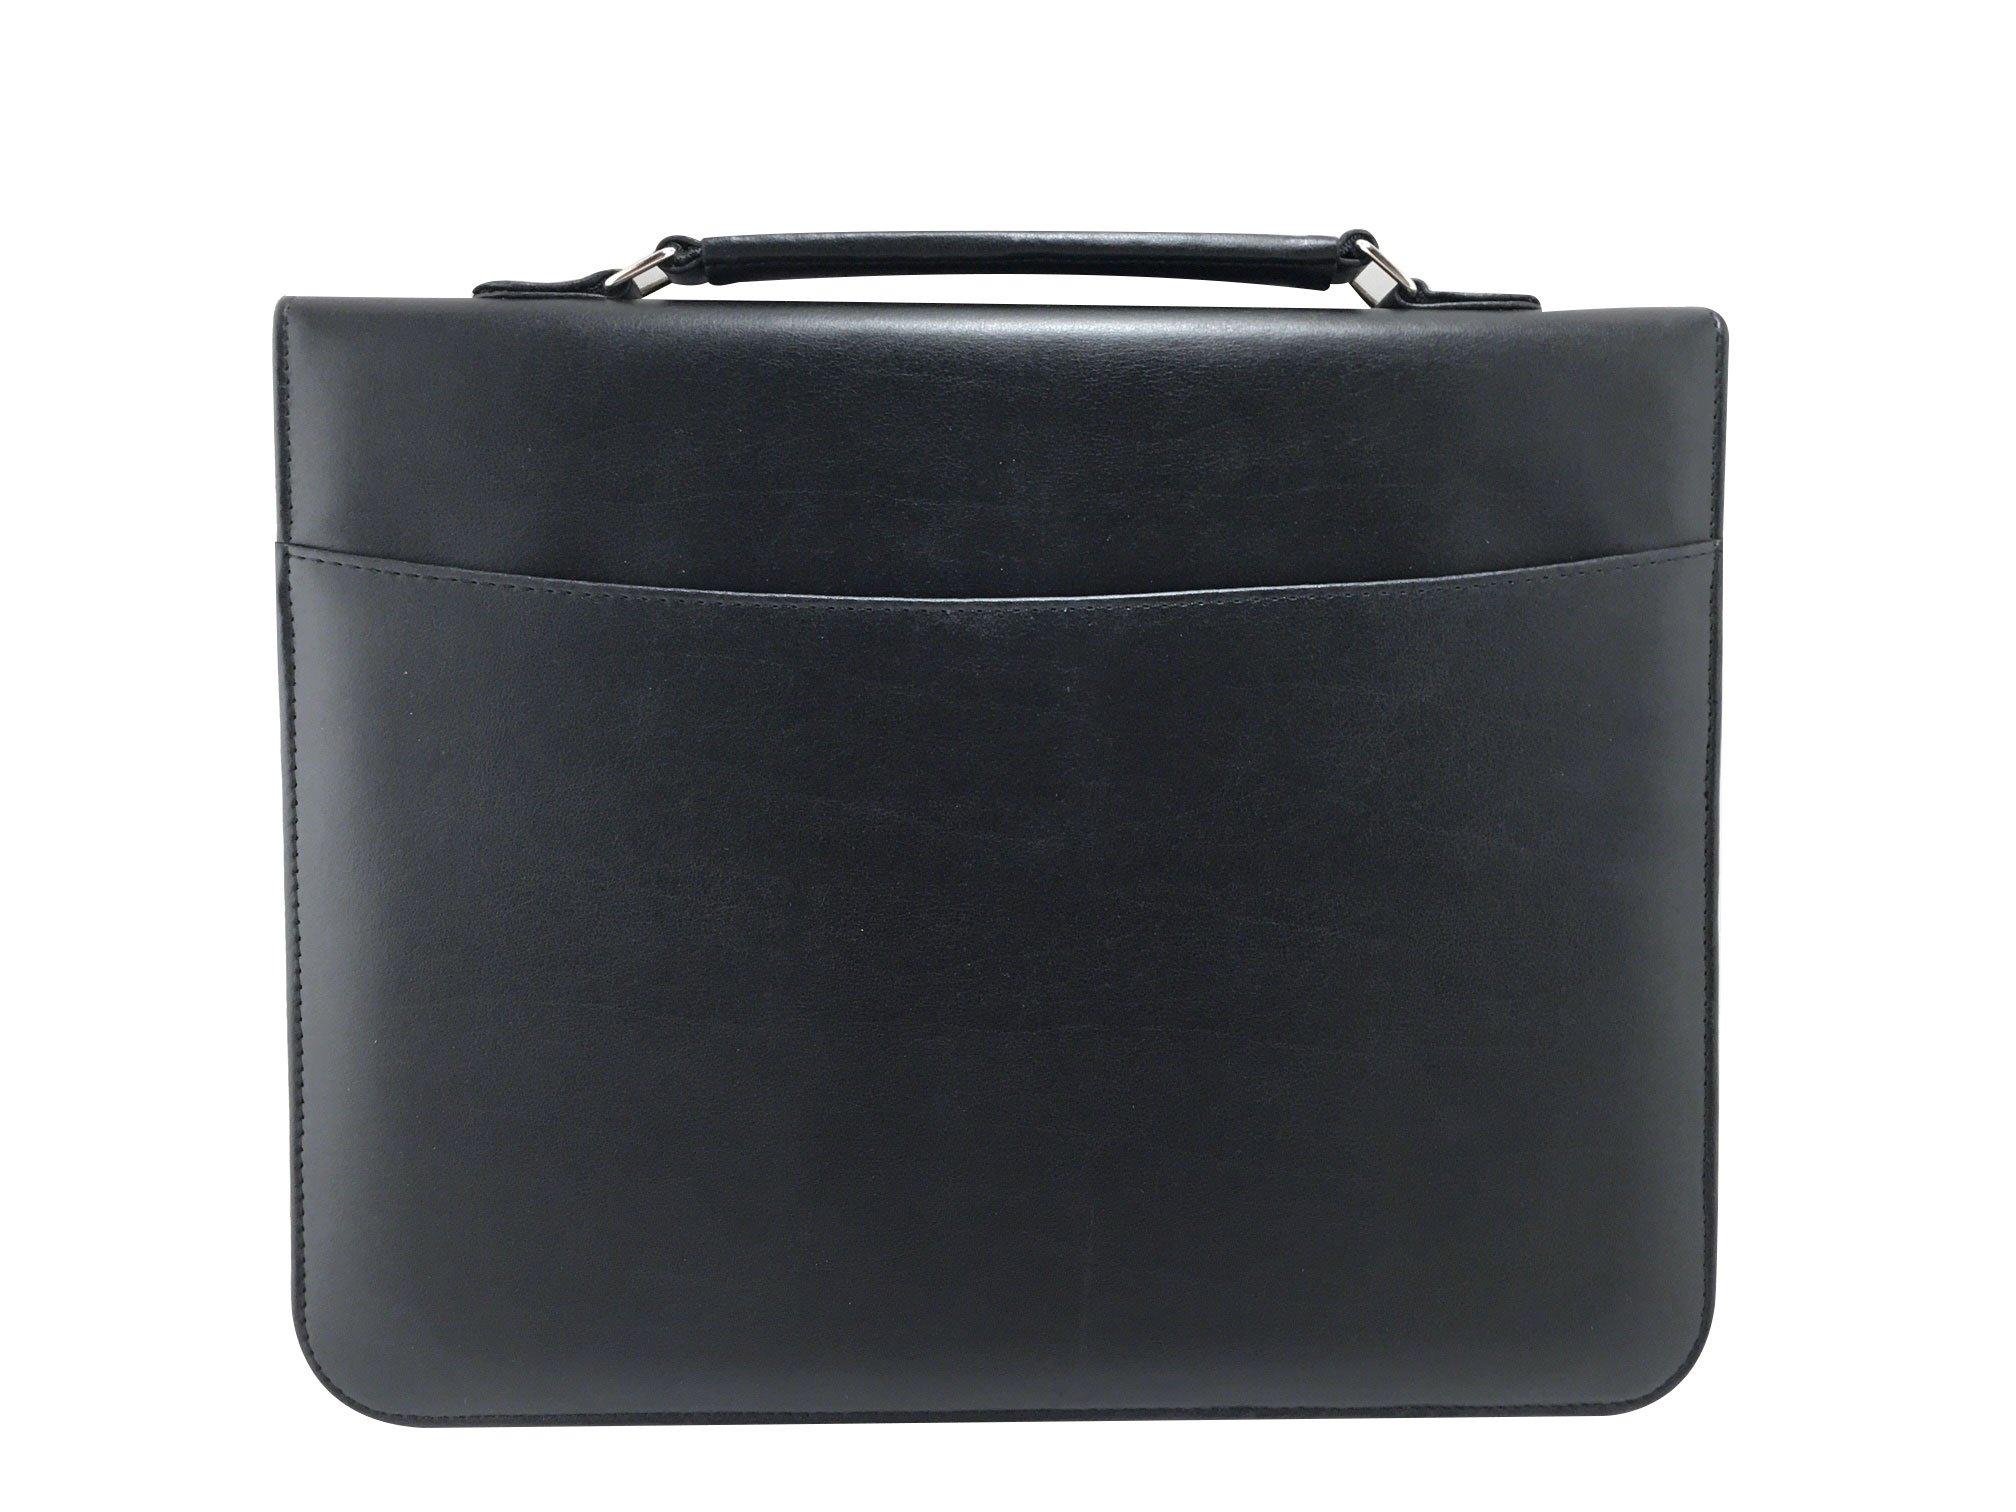 MSP Portfolio Organizer with Metal Hinge Handle, 3 Ring Binders, Binder Pockets (045) (Black)